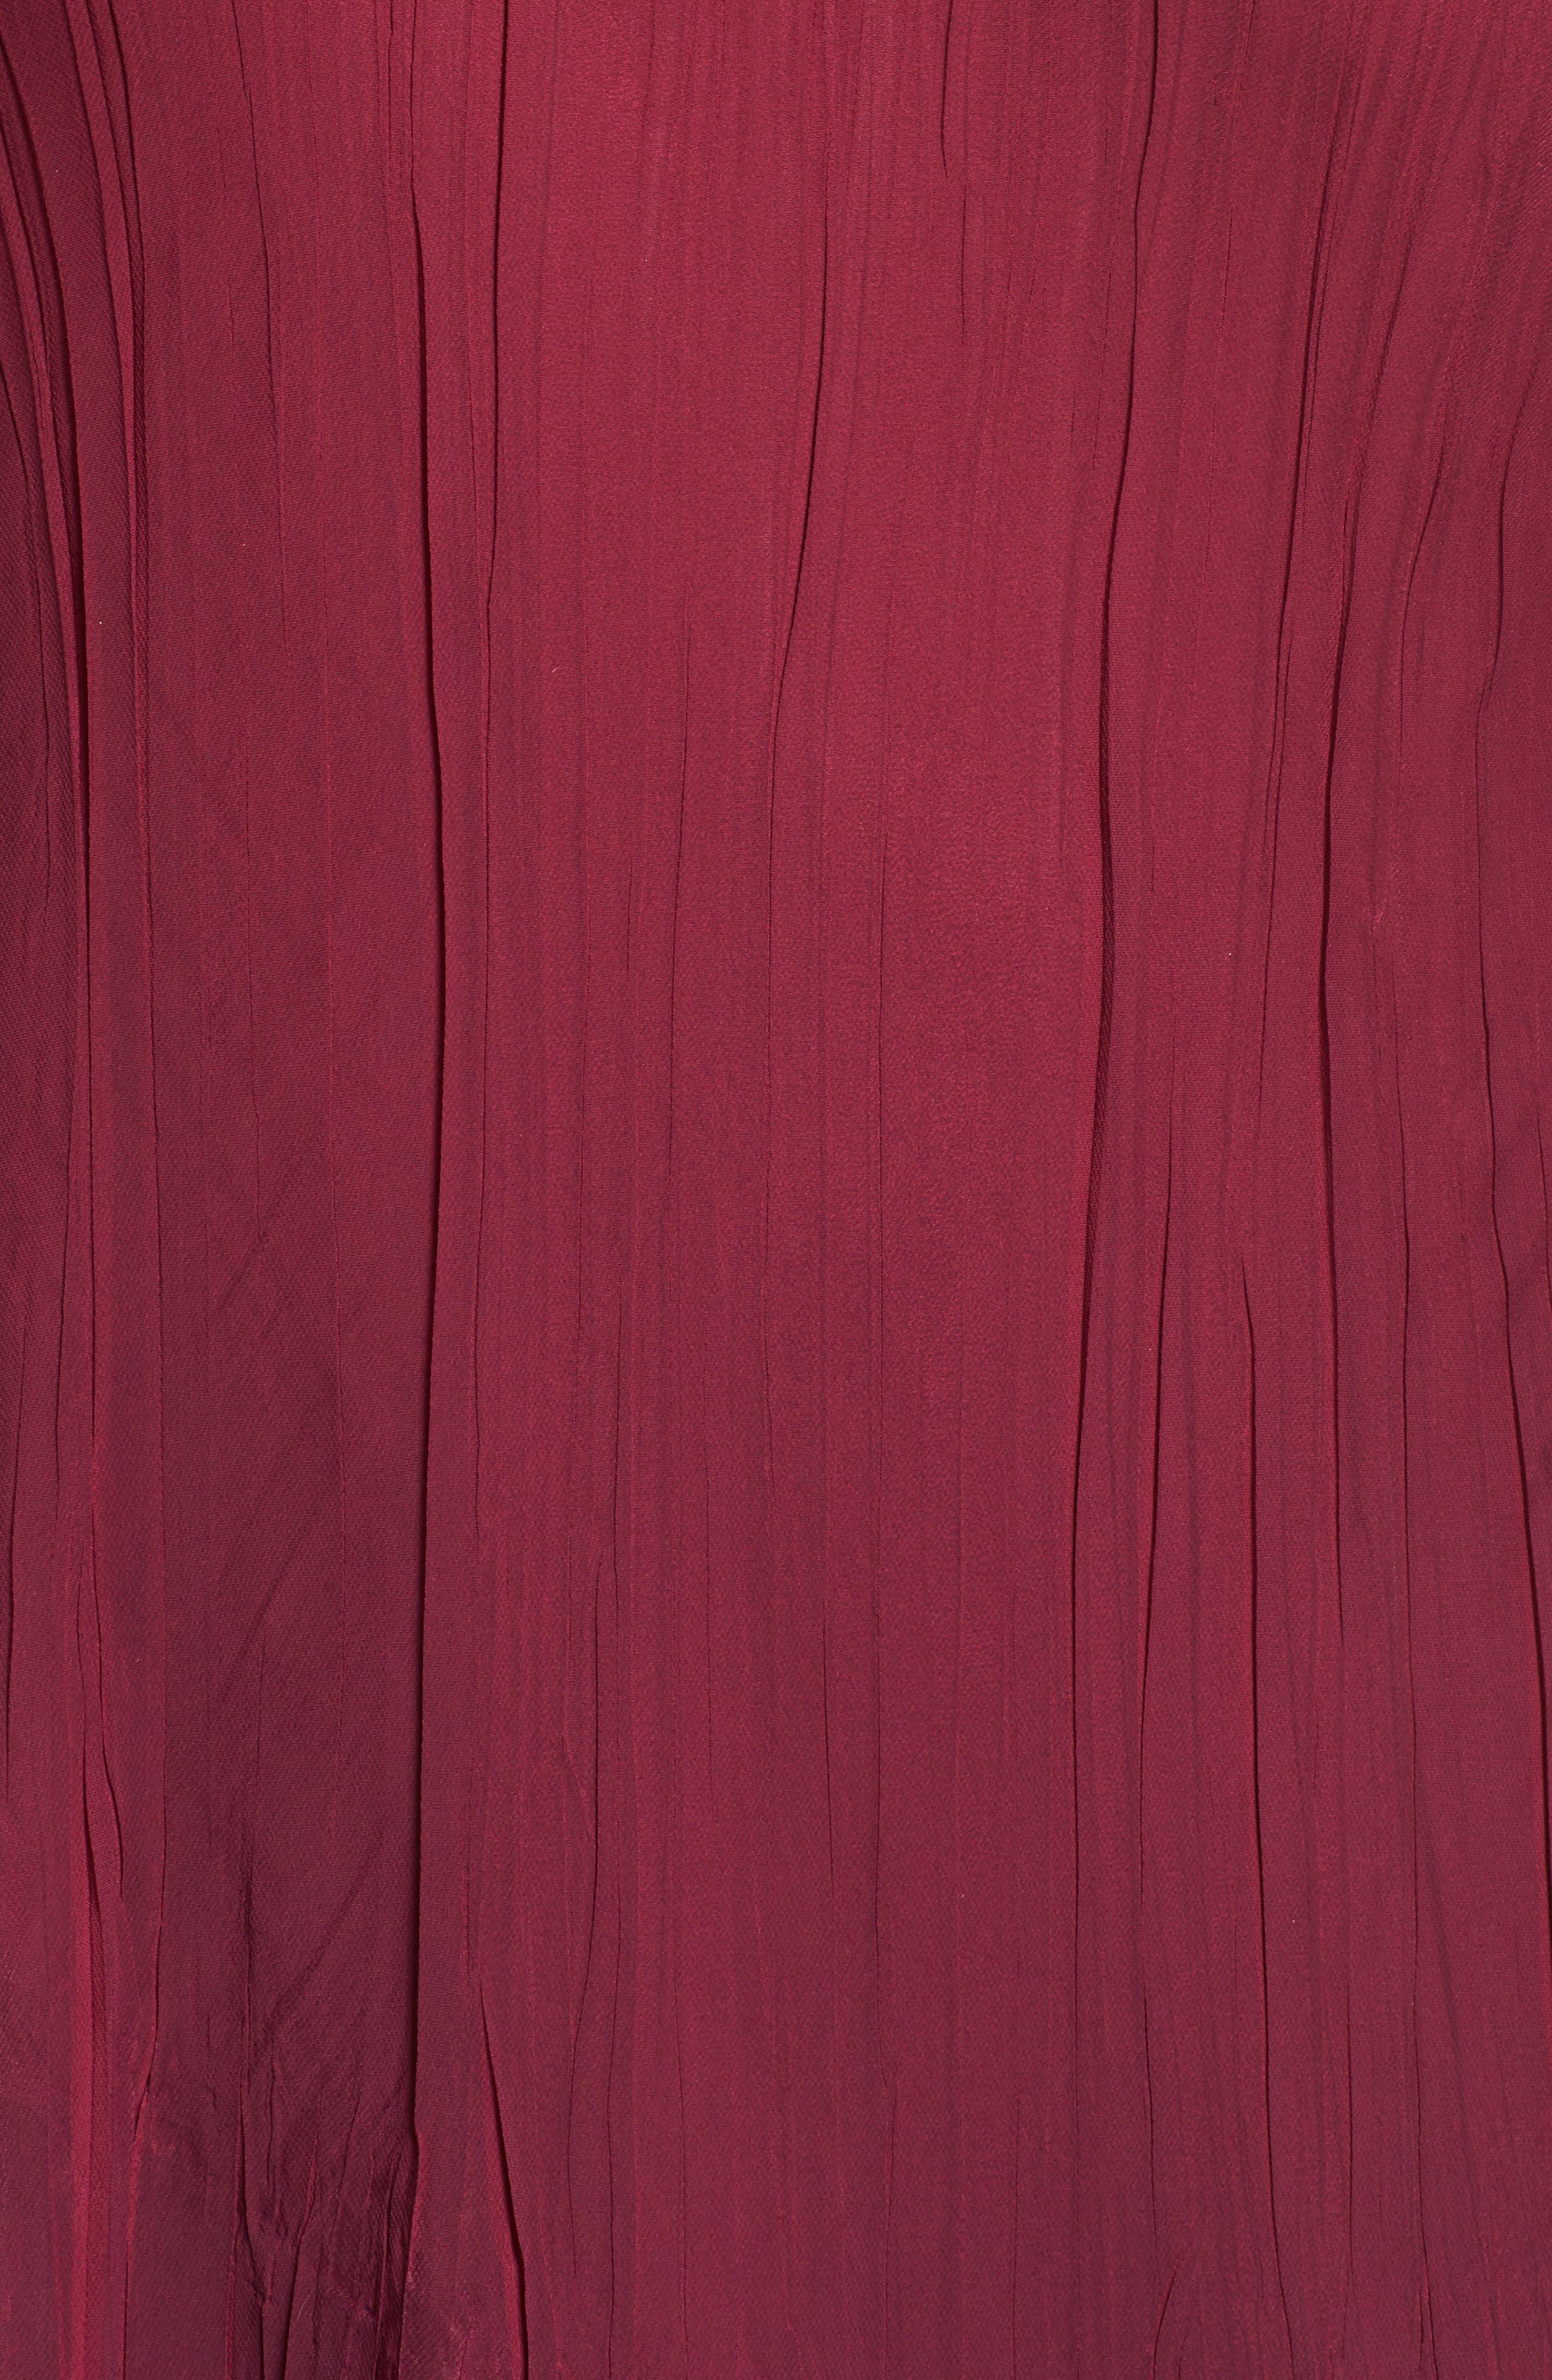 Tiered Ombrè Charmeuse & Chiffon Dress,                             Alternate thumbnail 5, color,                             644